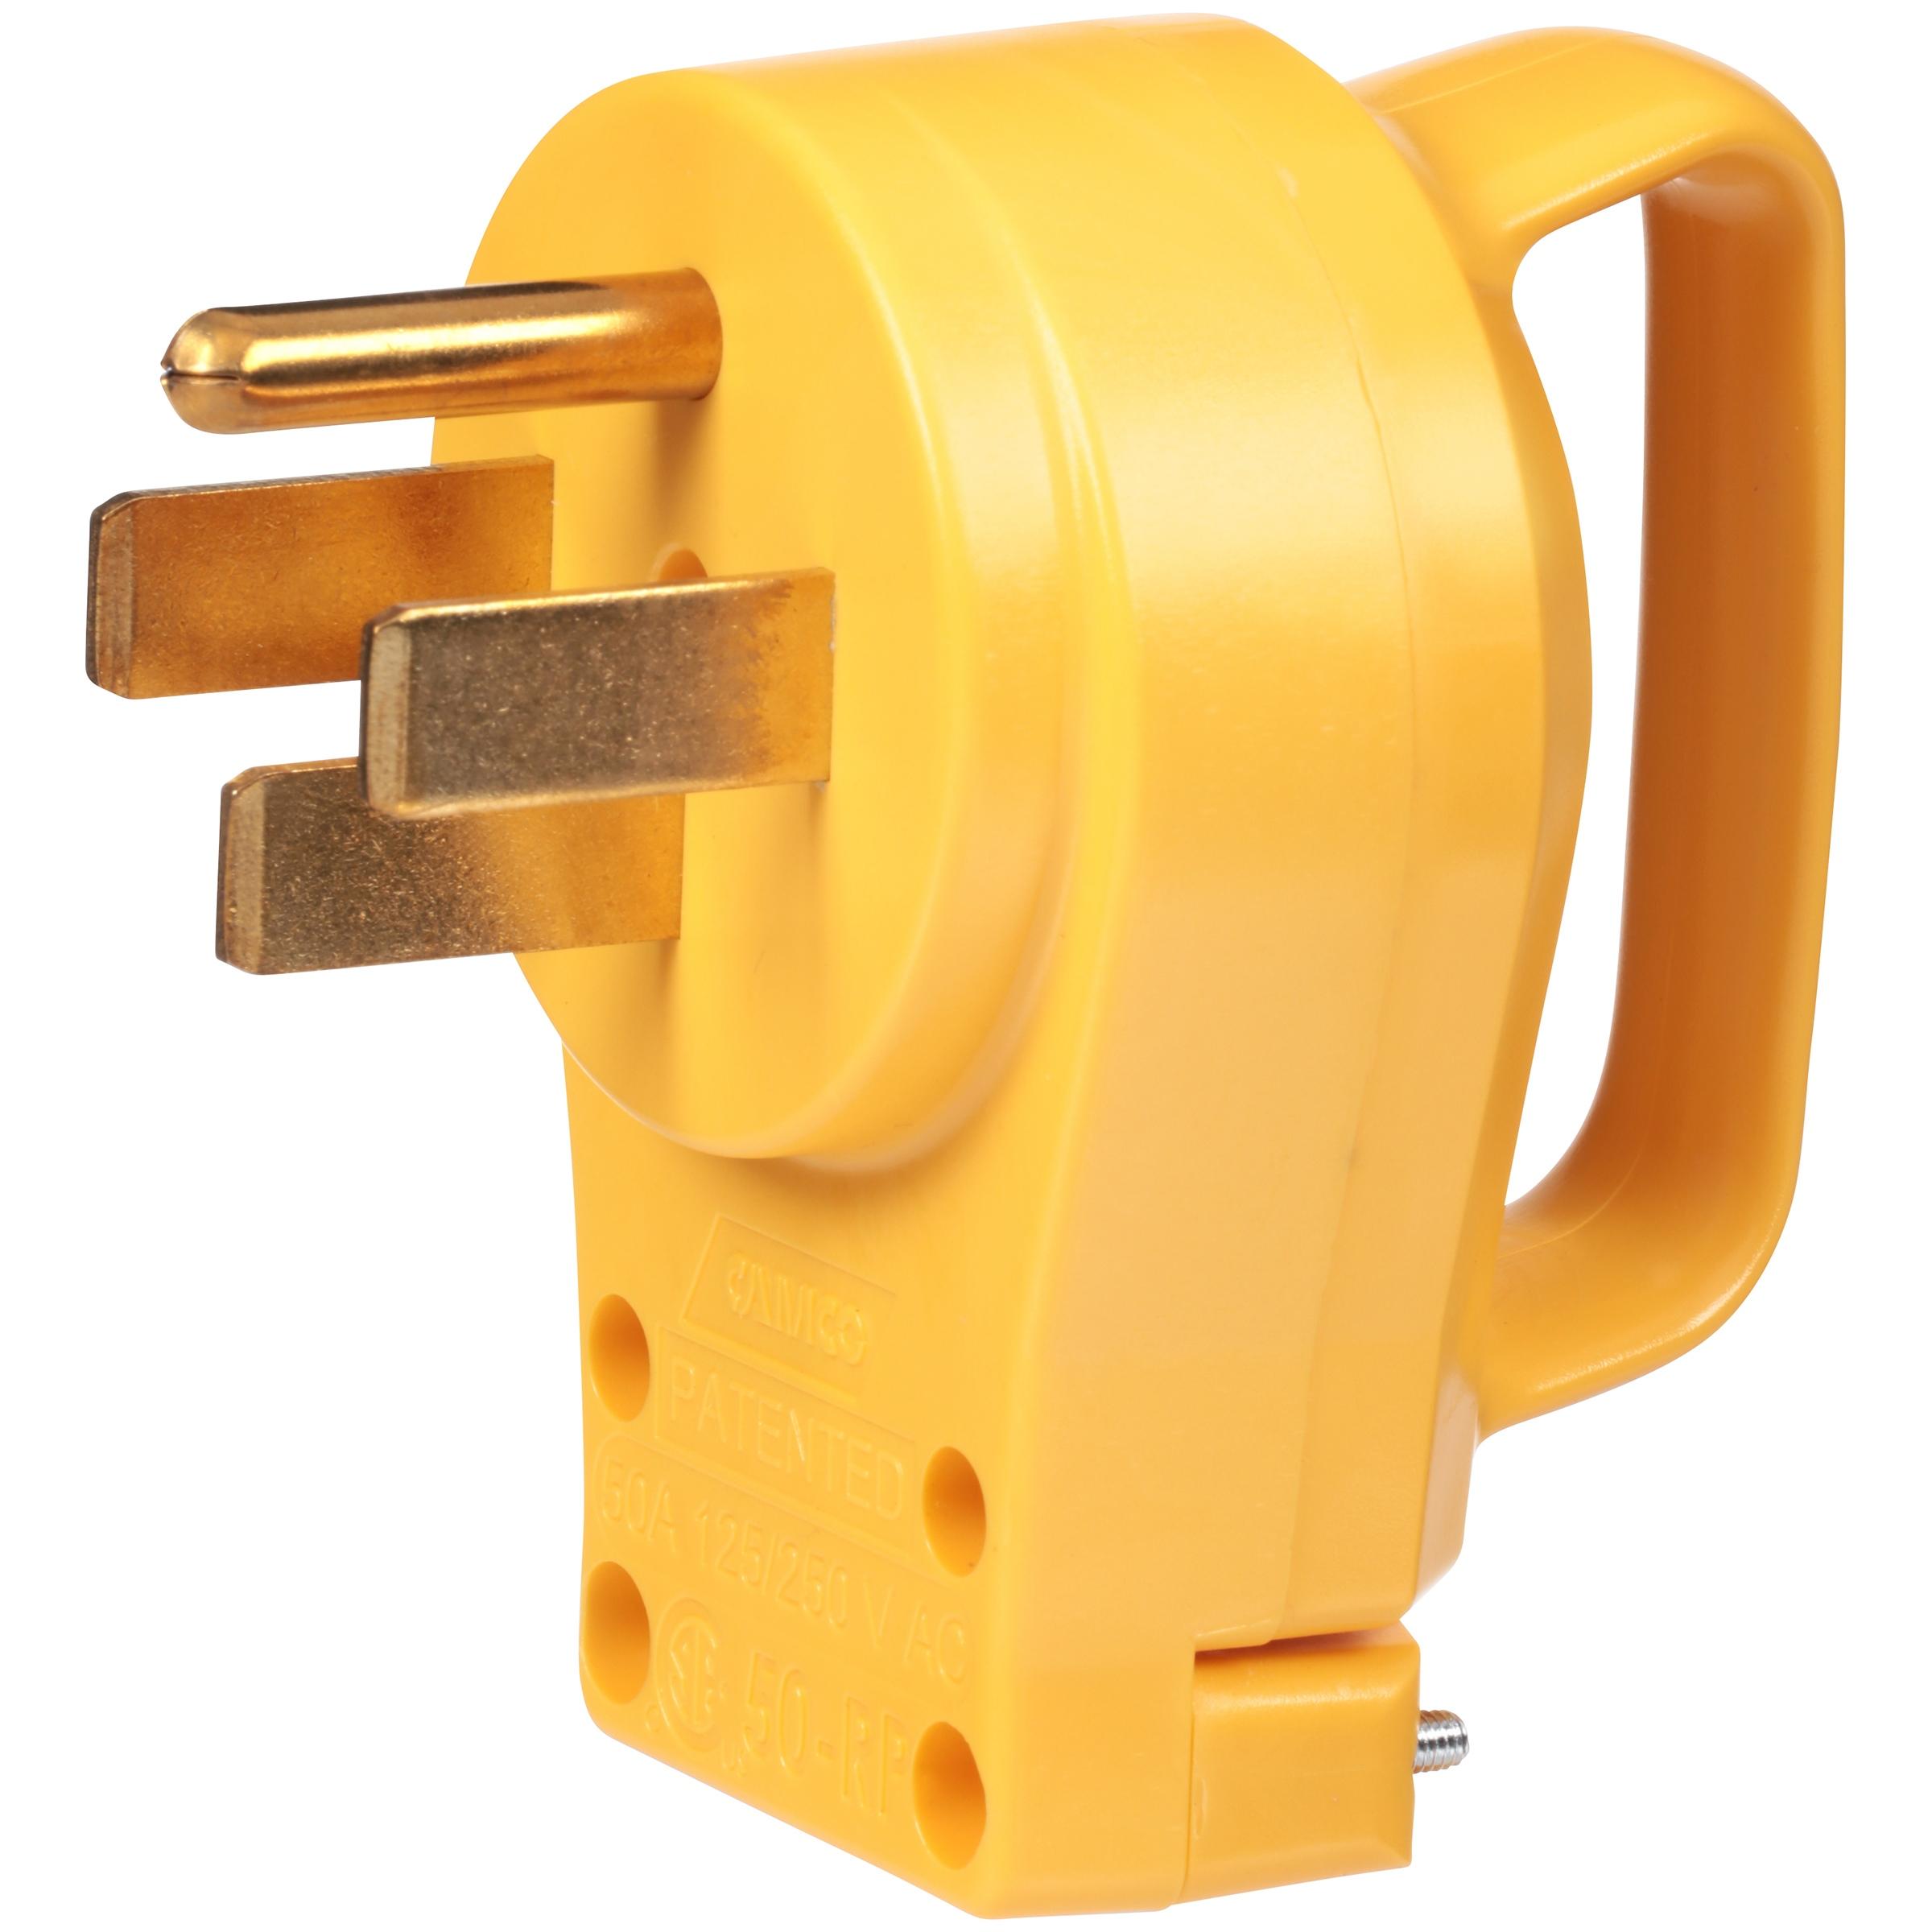 Camco PowerGrip Replacement Plug- PoweGrip Cord 50 AMP ($10.47) @Amazon